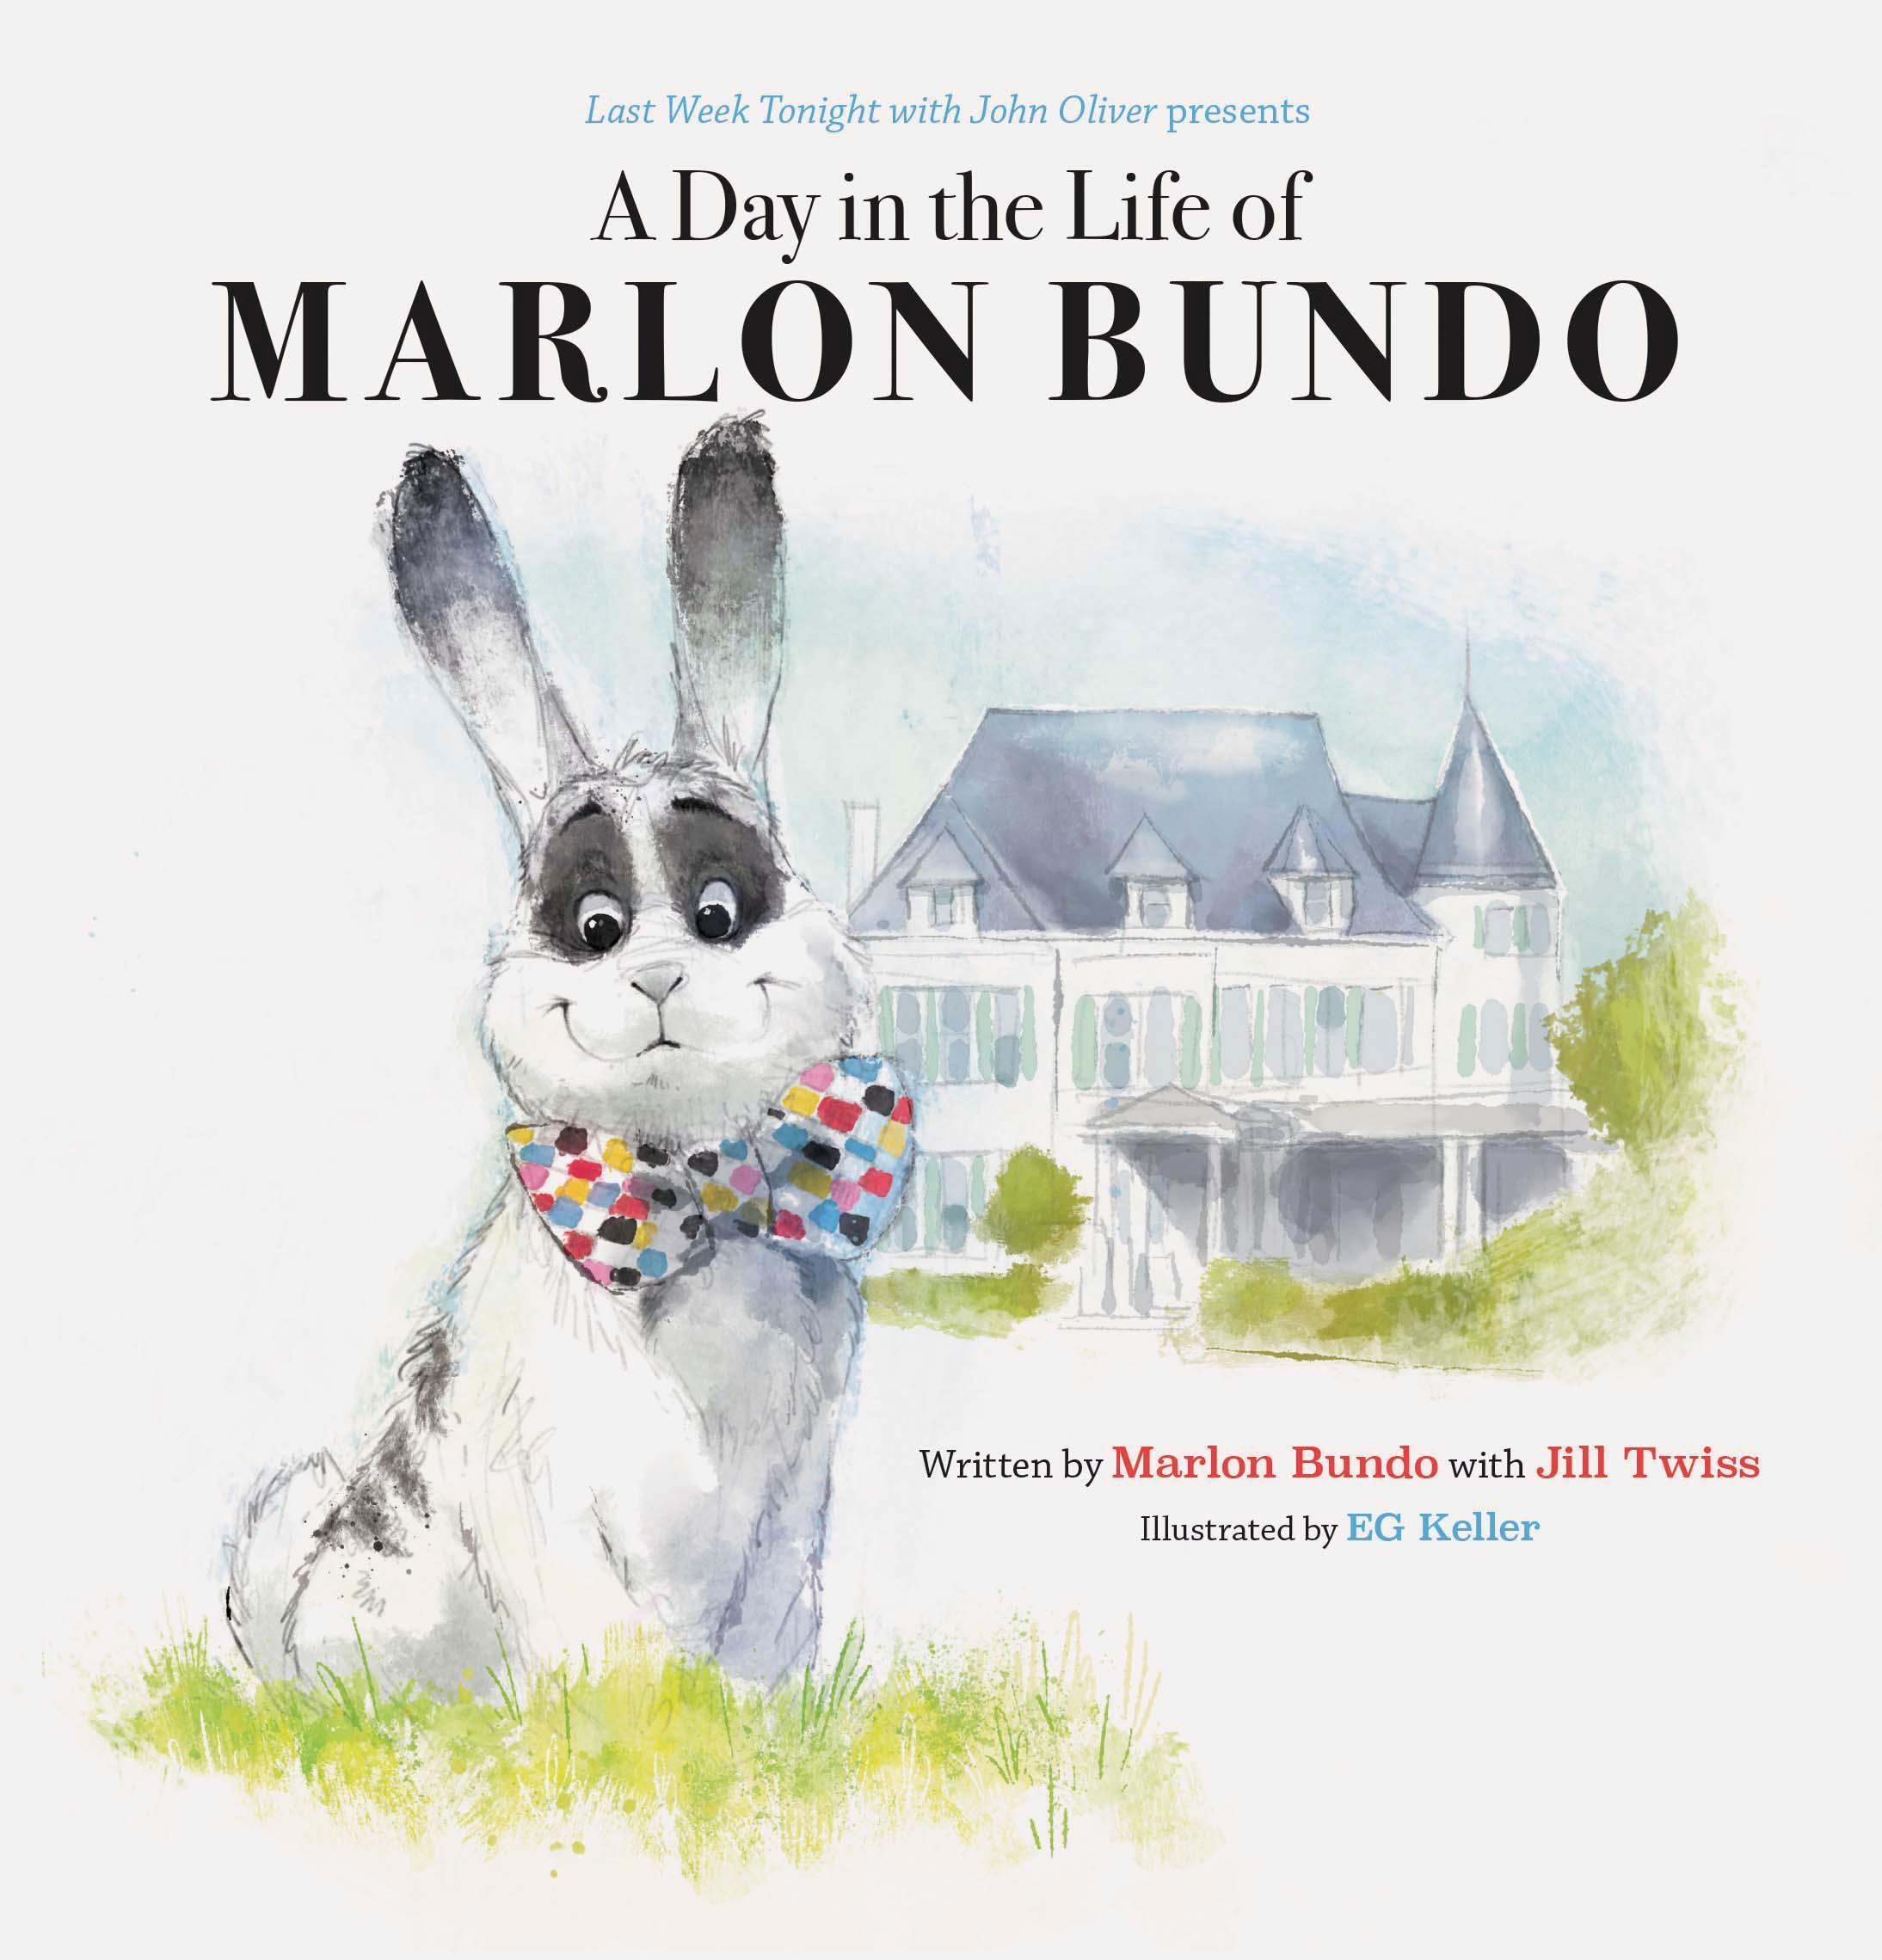 A Day in the Life of Marlon Bundo (Hardcover)